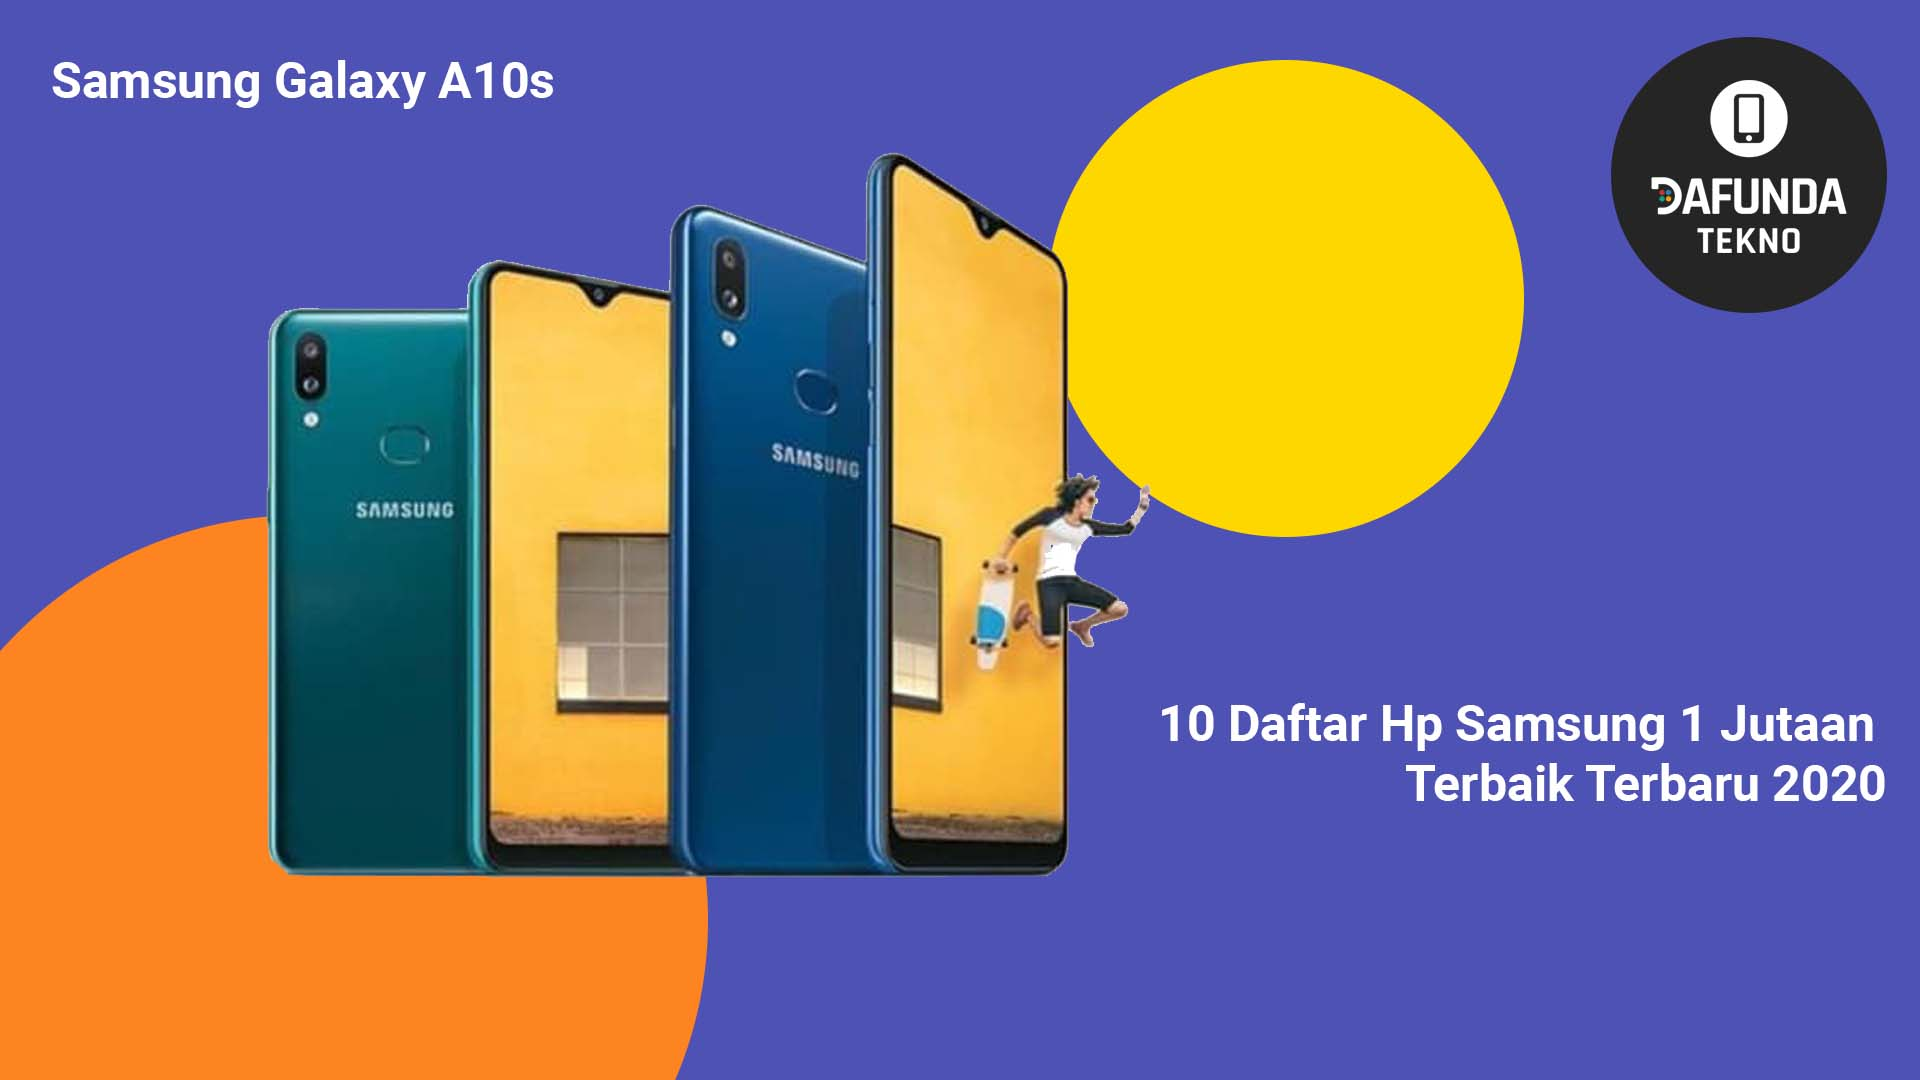 Hp Samsung 1 Jutaan Terbaik Samsung Galaxy A10s